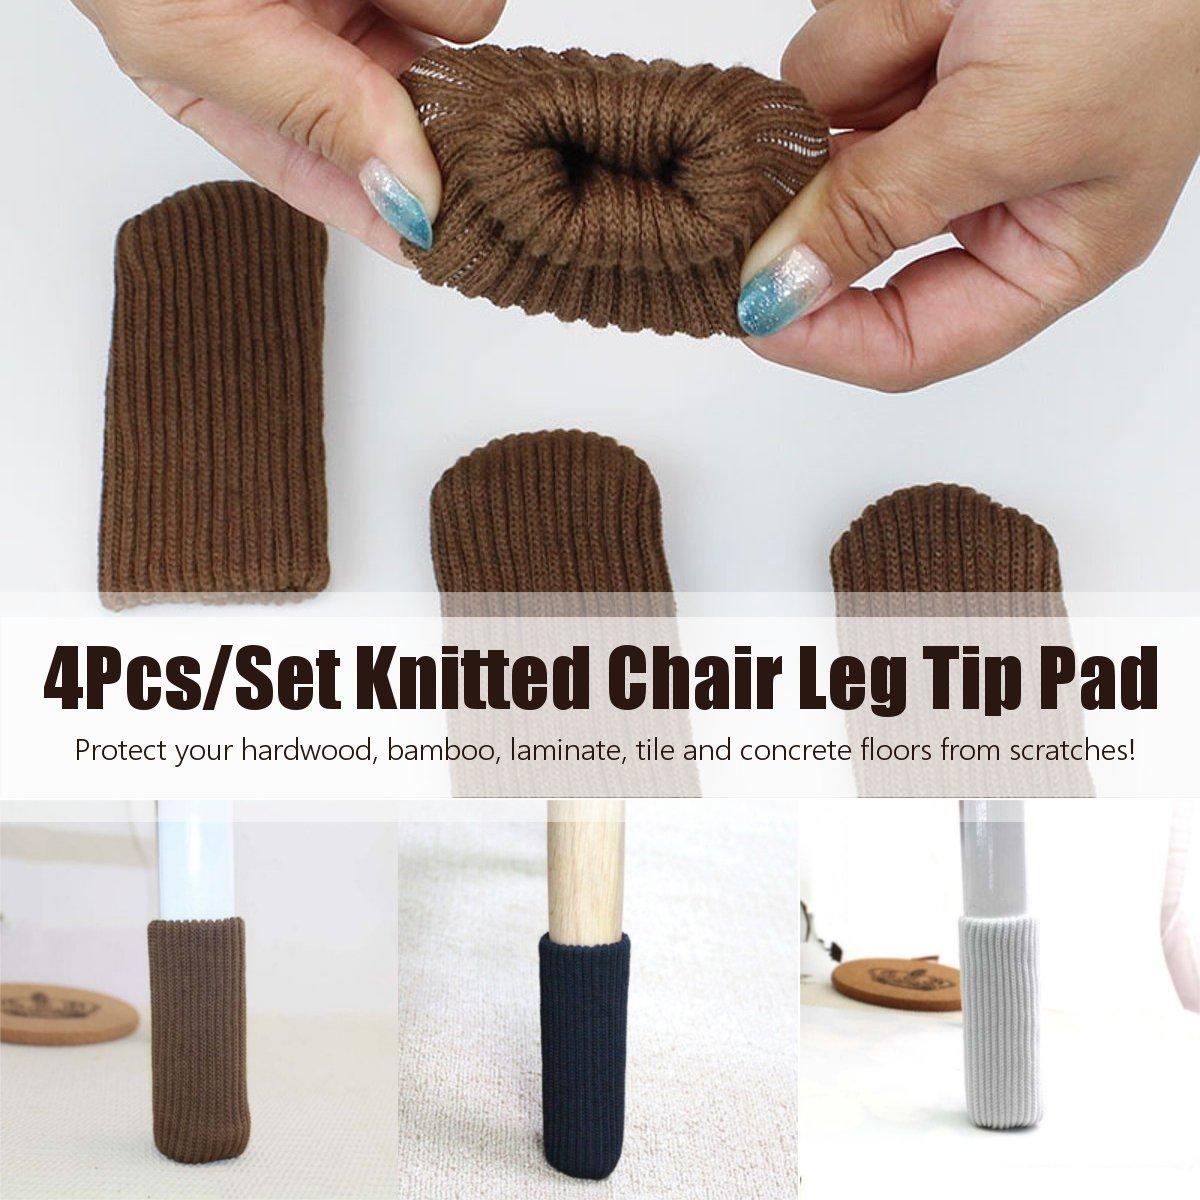 4PCS Chair Leg Tip Pad Cover Furniture Elastic Non-Slip Sock Floor Protector Table Chair Feet Furniture Accessories 3 Colors